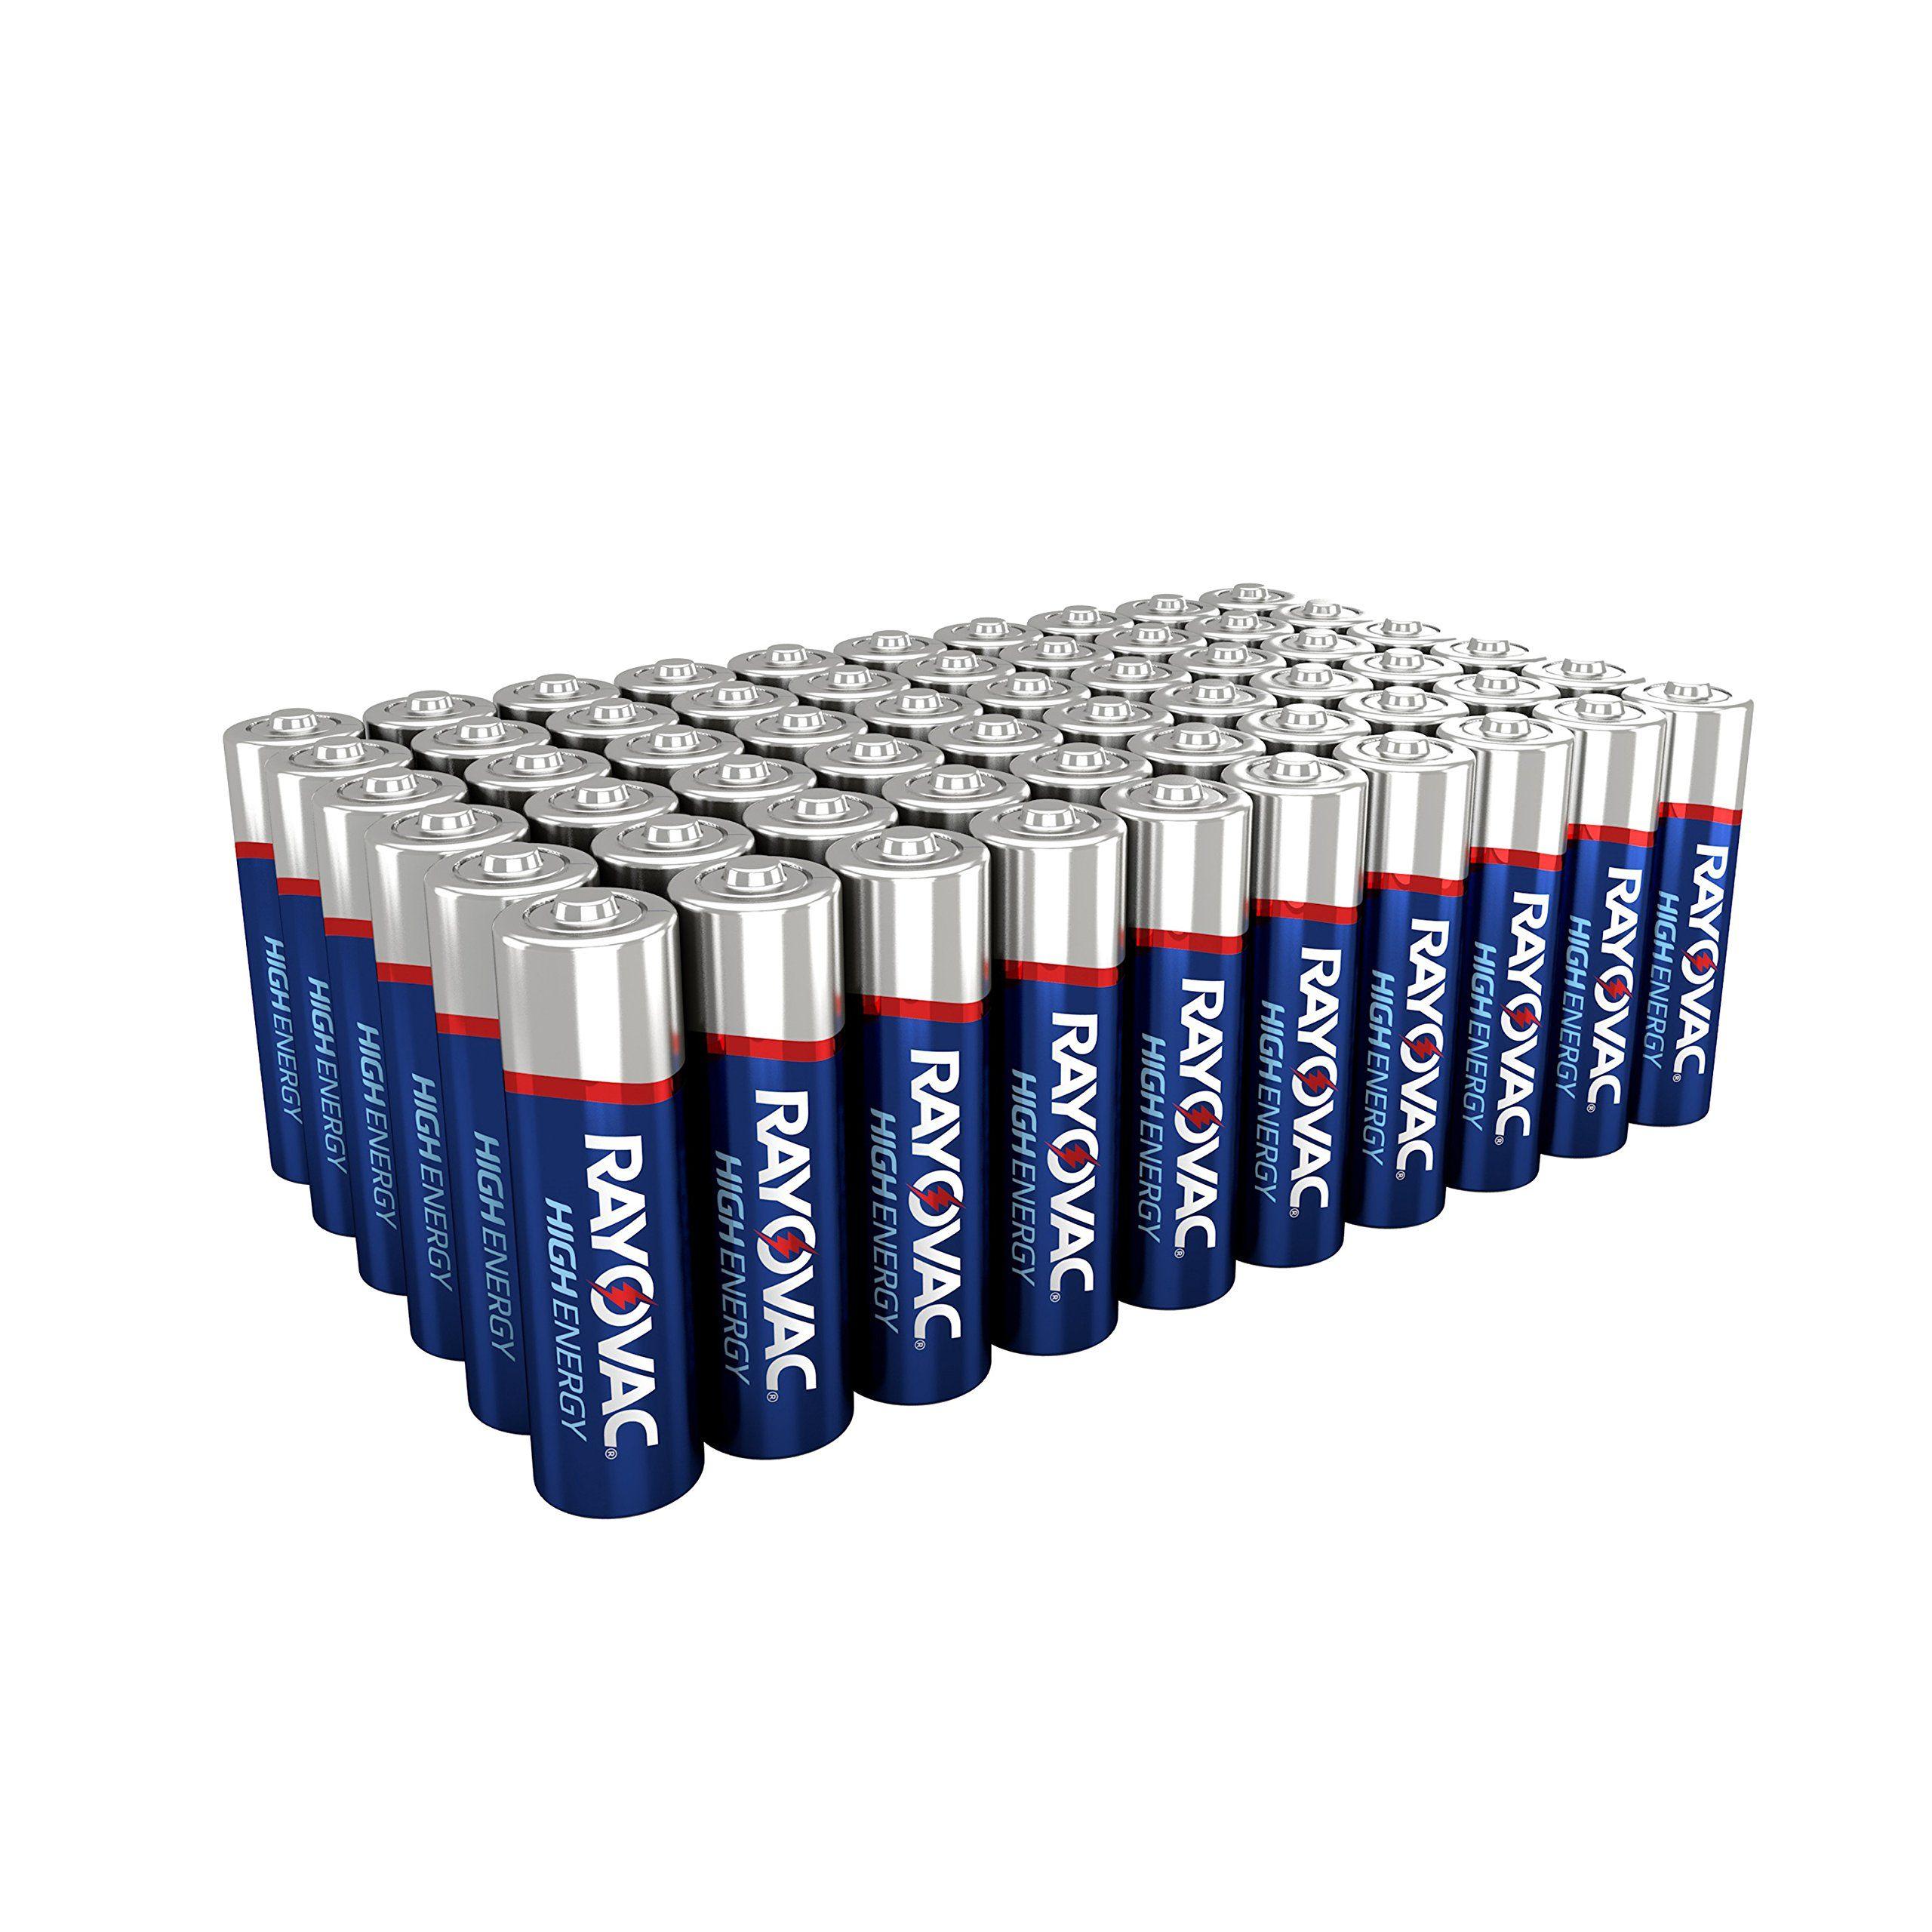 Rayovac Aa Batteries Double A Alkaline Batteries 60 Battery Count Batteries Double Rayovac Aa Battery Pack Alkaline Battery Batteries